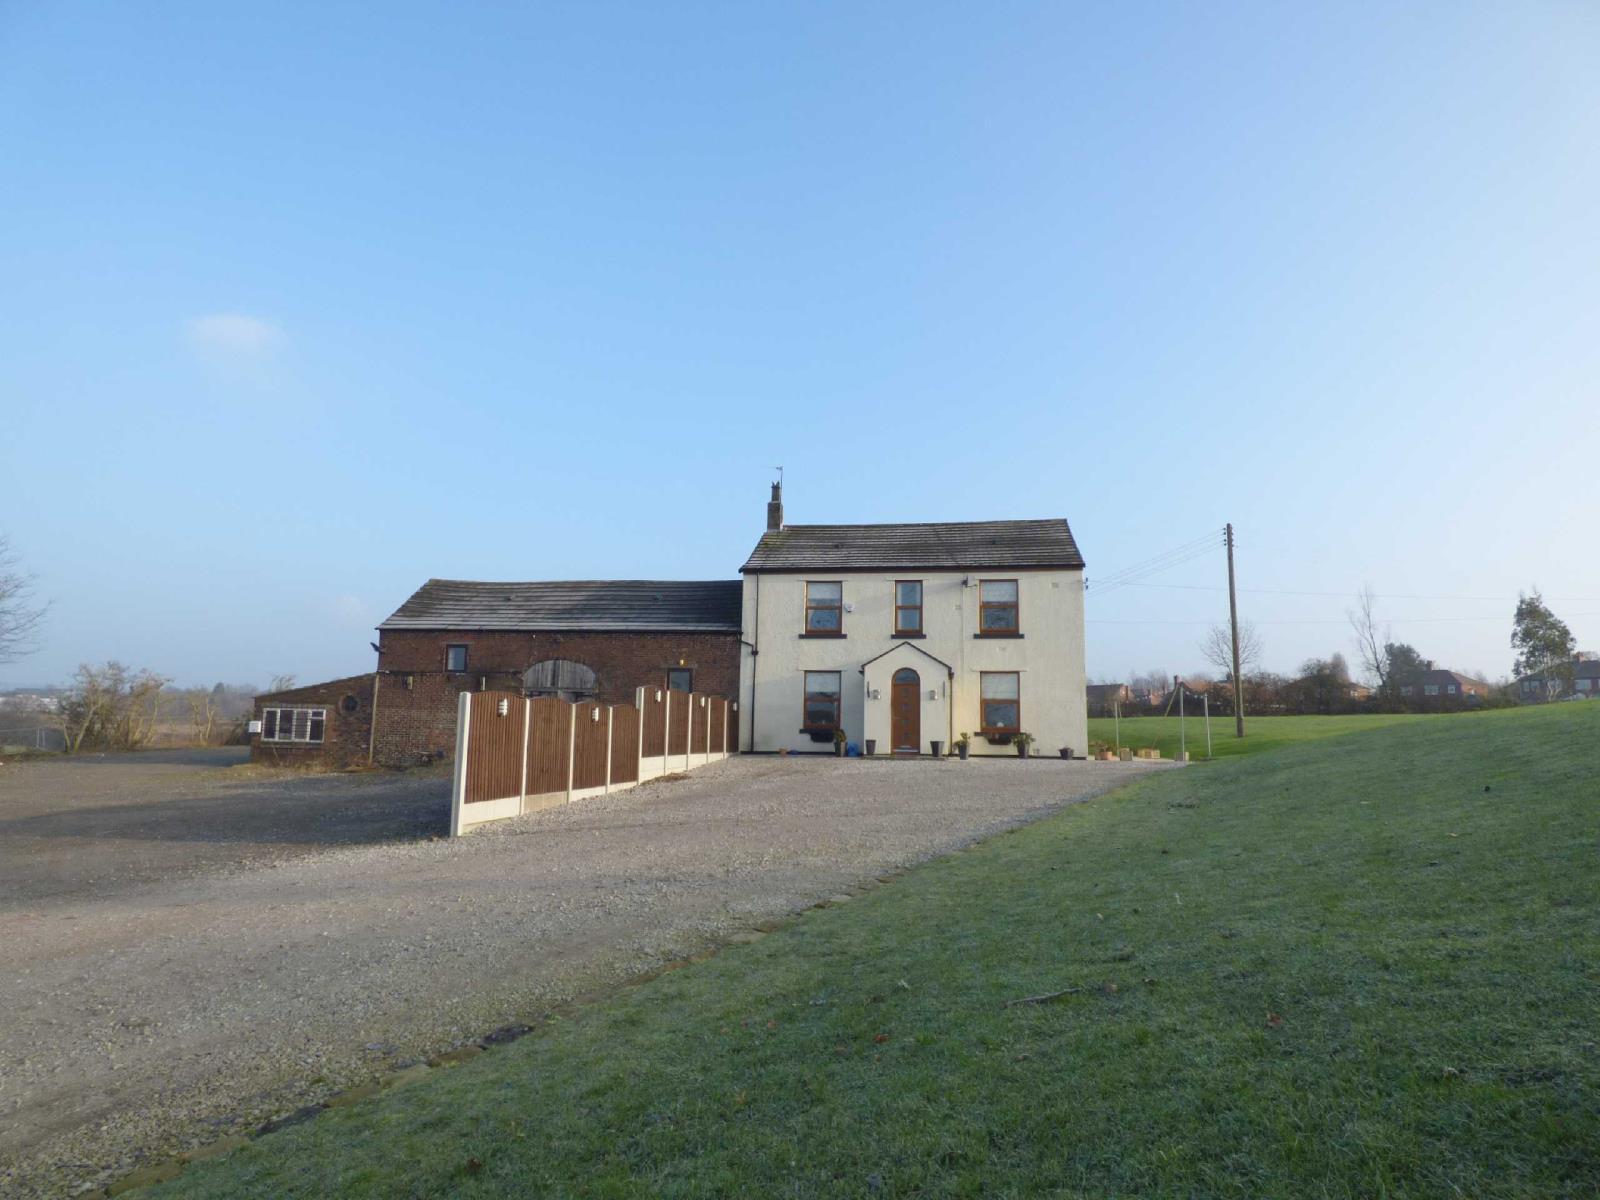 3 Bedrooms Detached House for sale in Matthew Fold Farm, Off Foxdenton Lane, Chadderton, Oldham, OL9